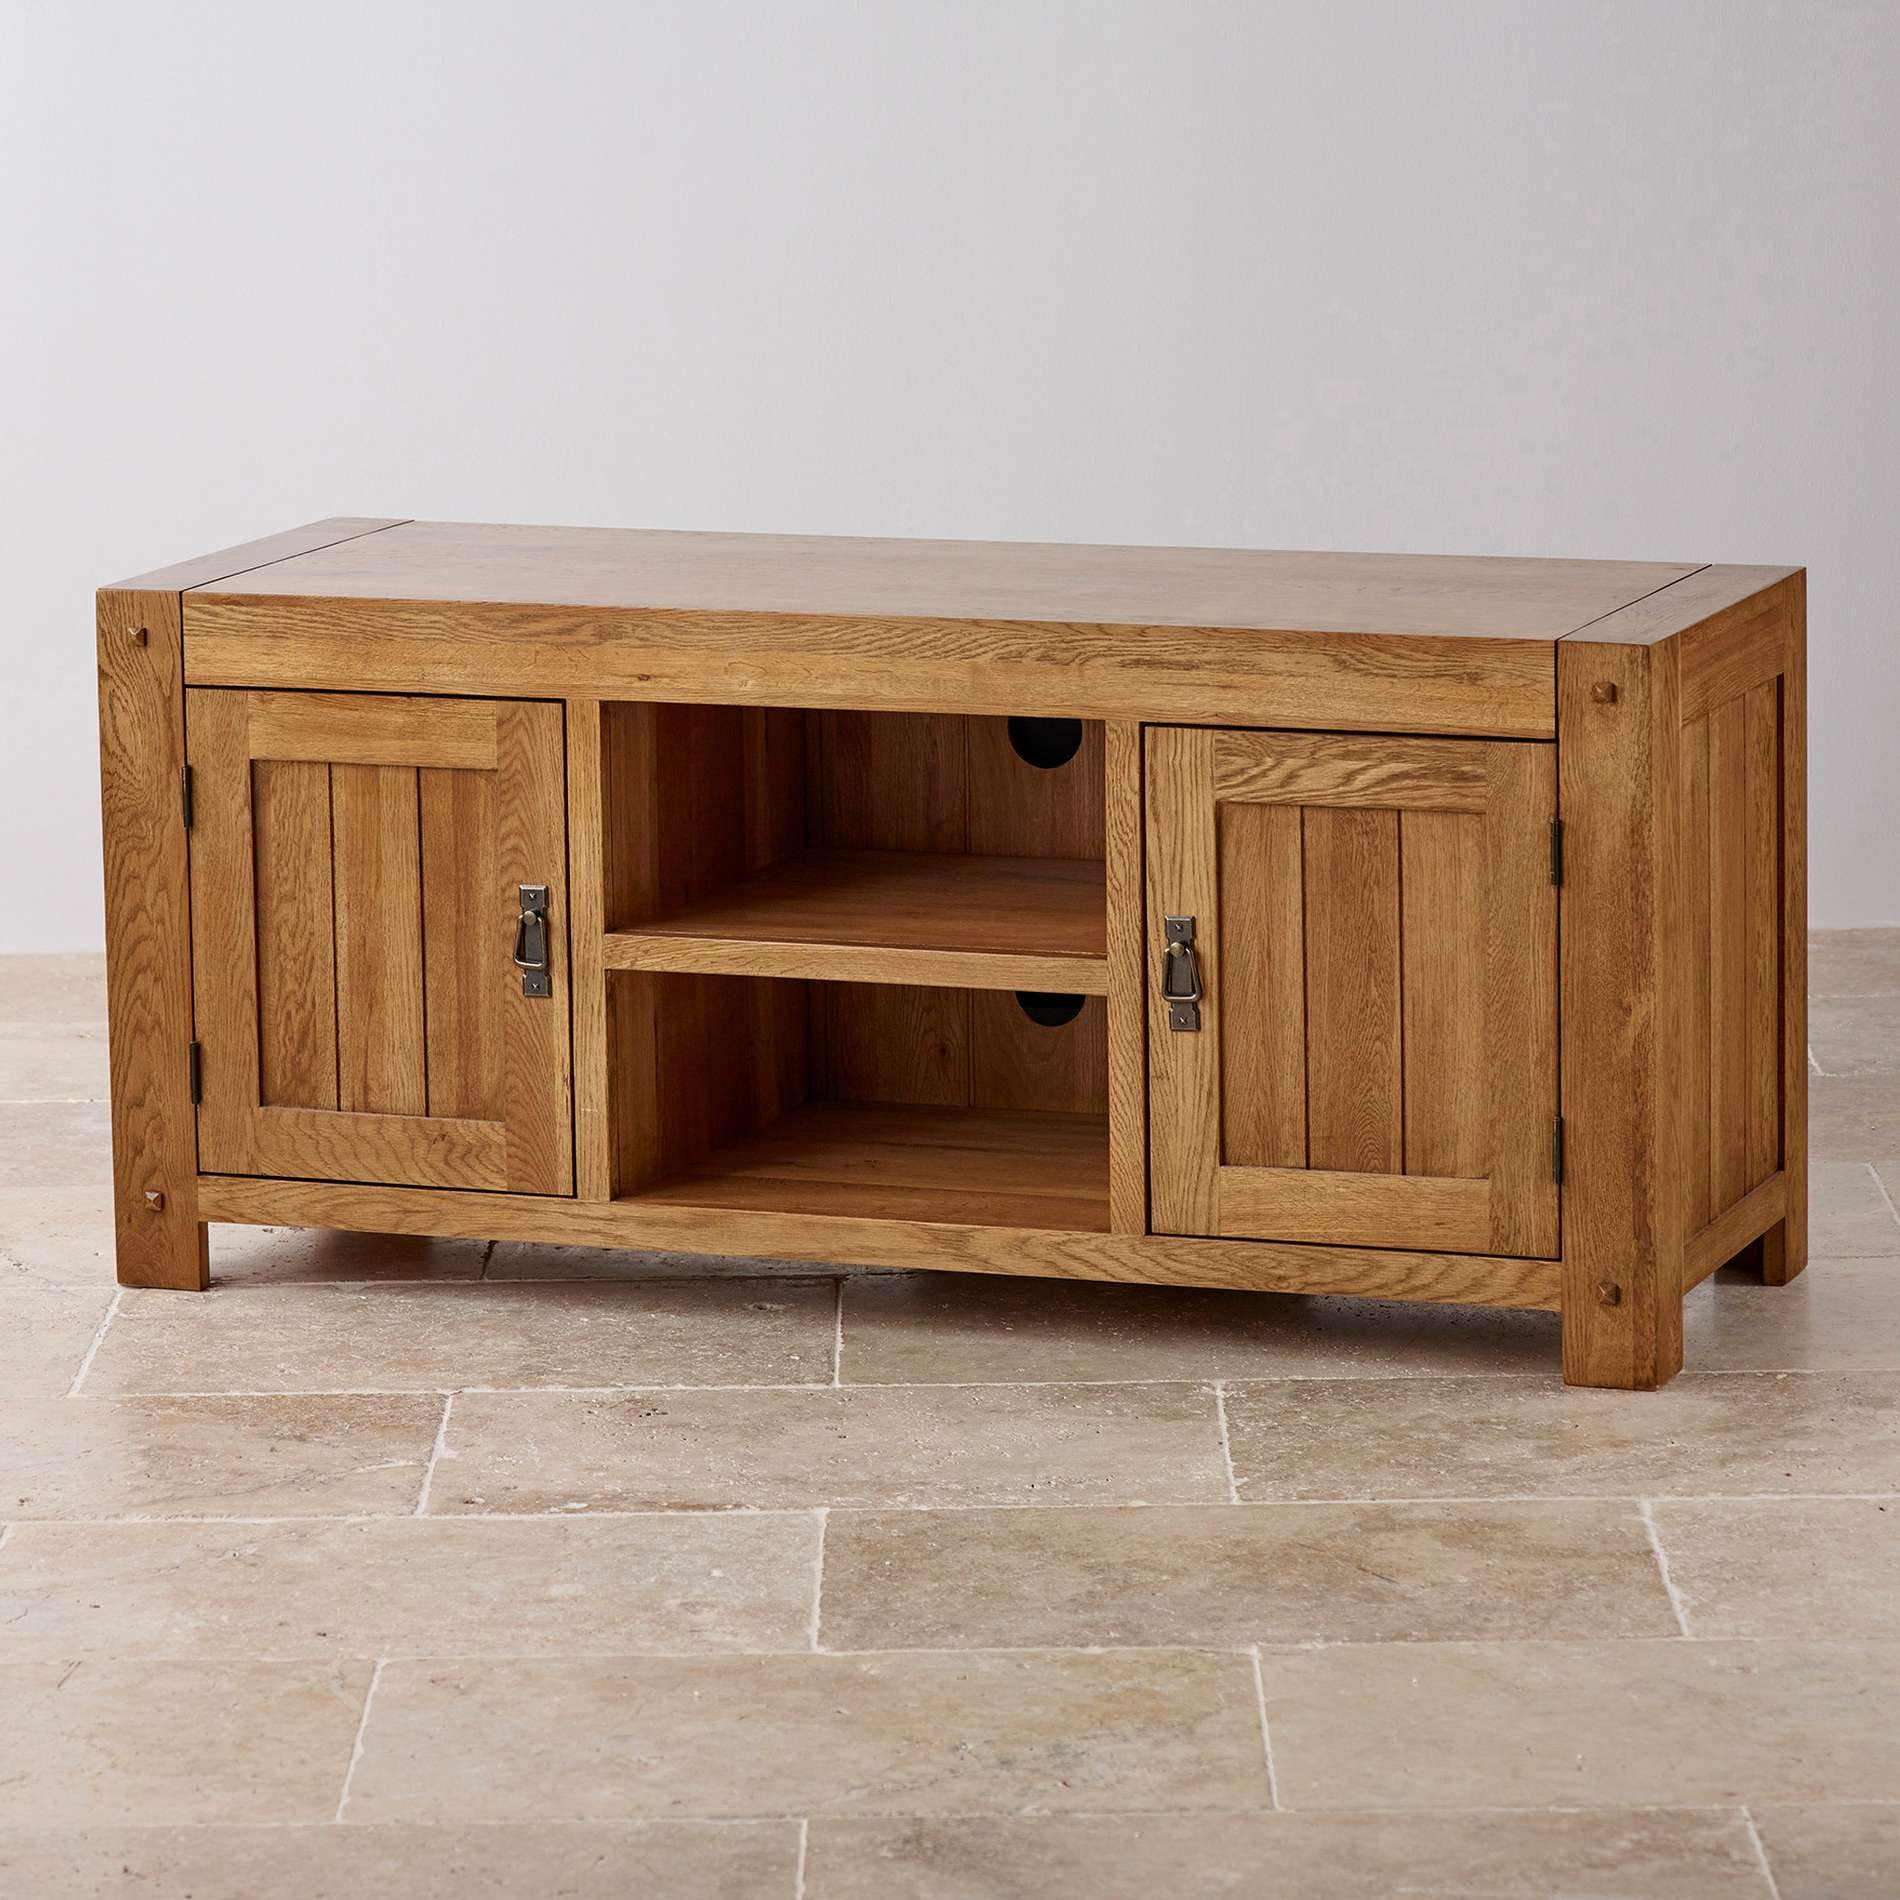 Tv Cabinets | Mango, Painted & Oak Tv Units | Oak Furniture Land Inside Wide Tv Cabinets (View 7 of 20)